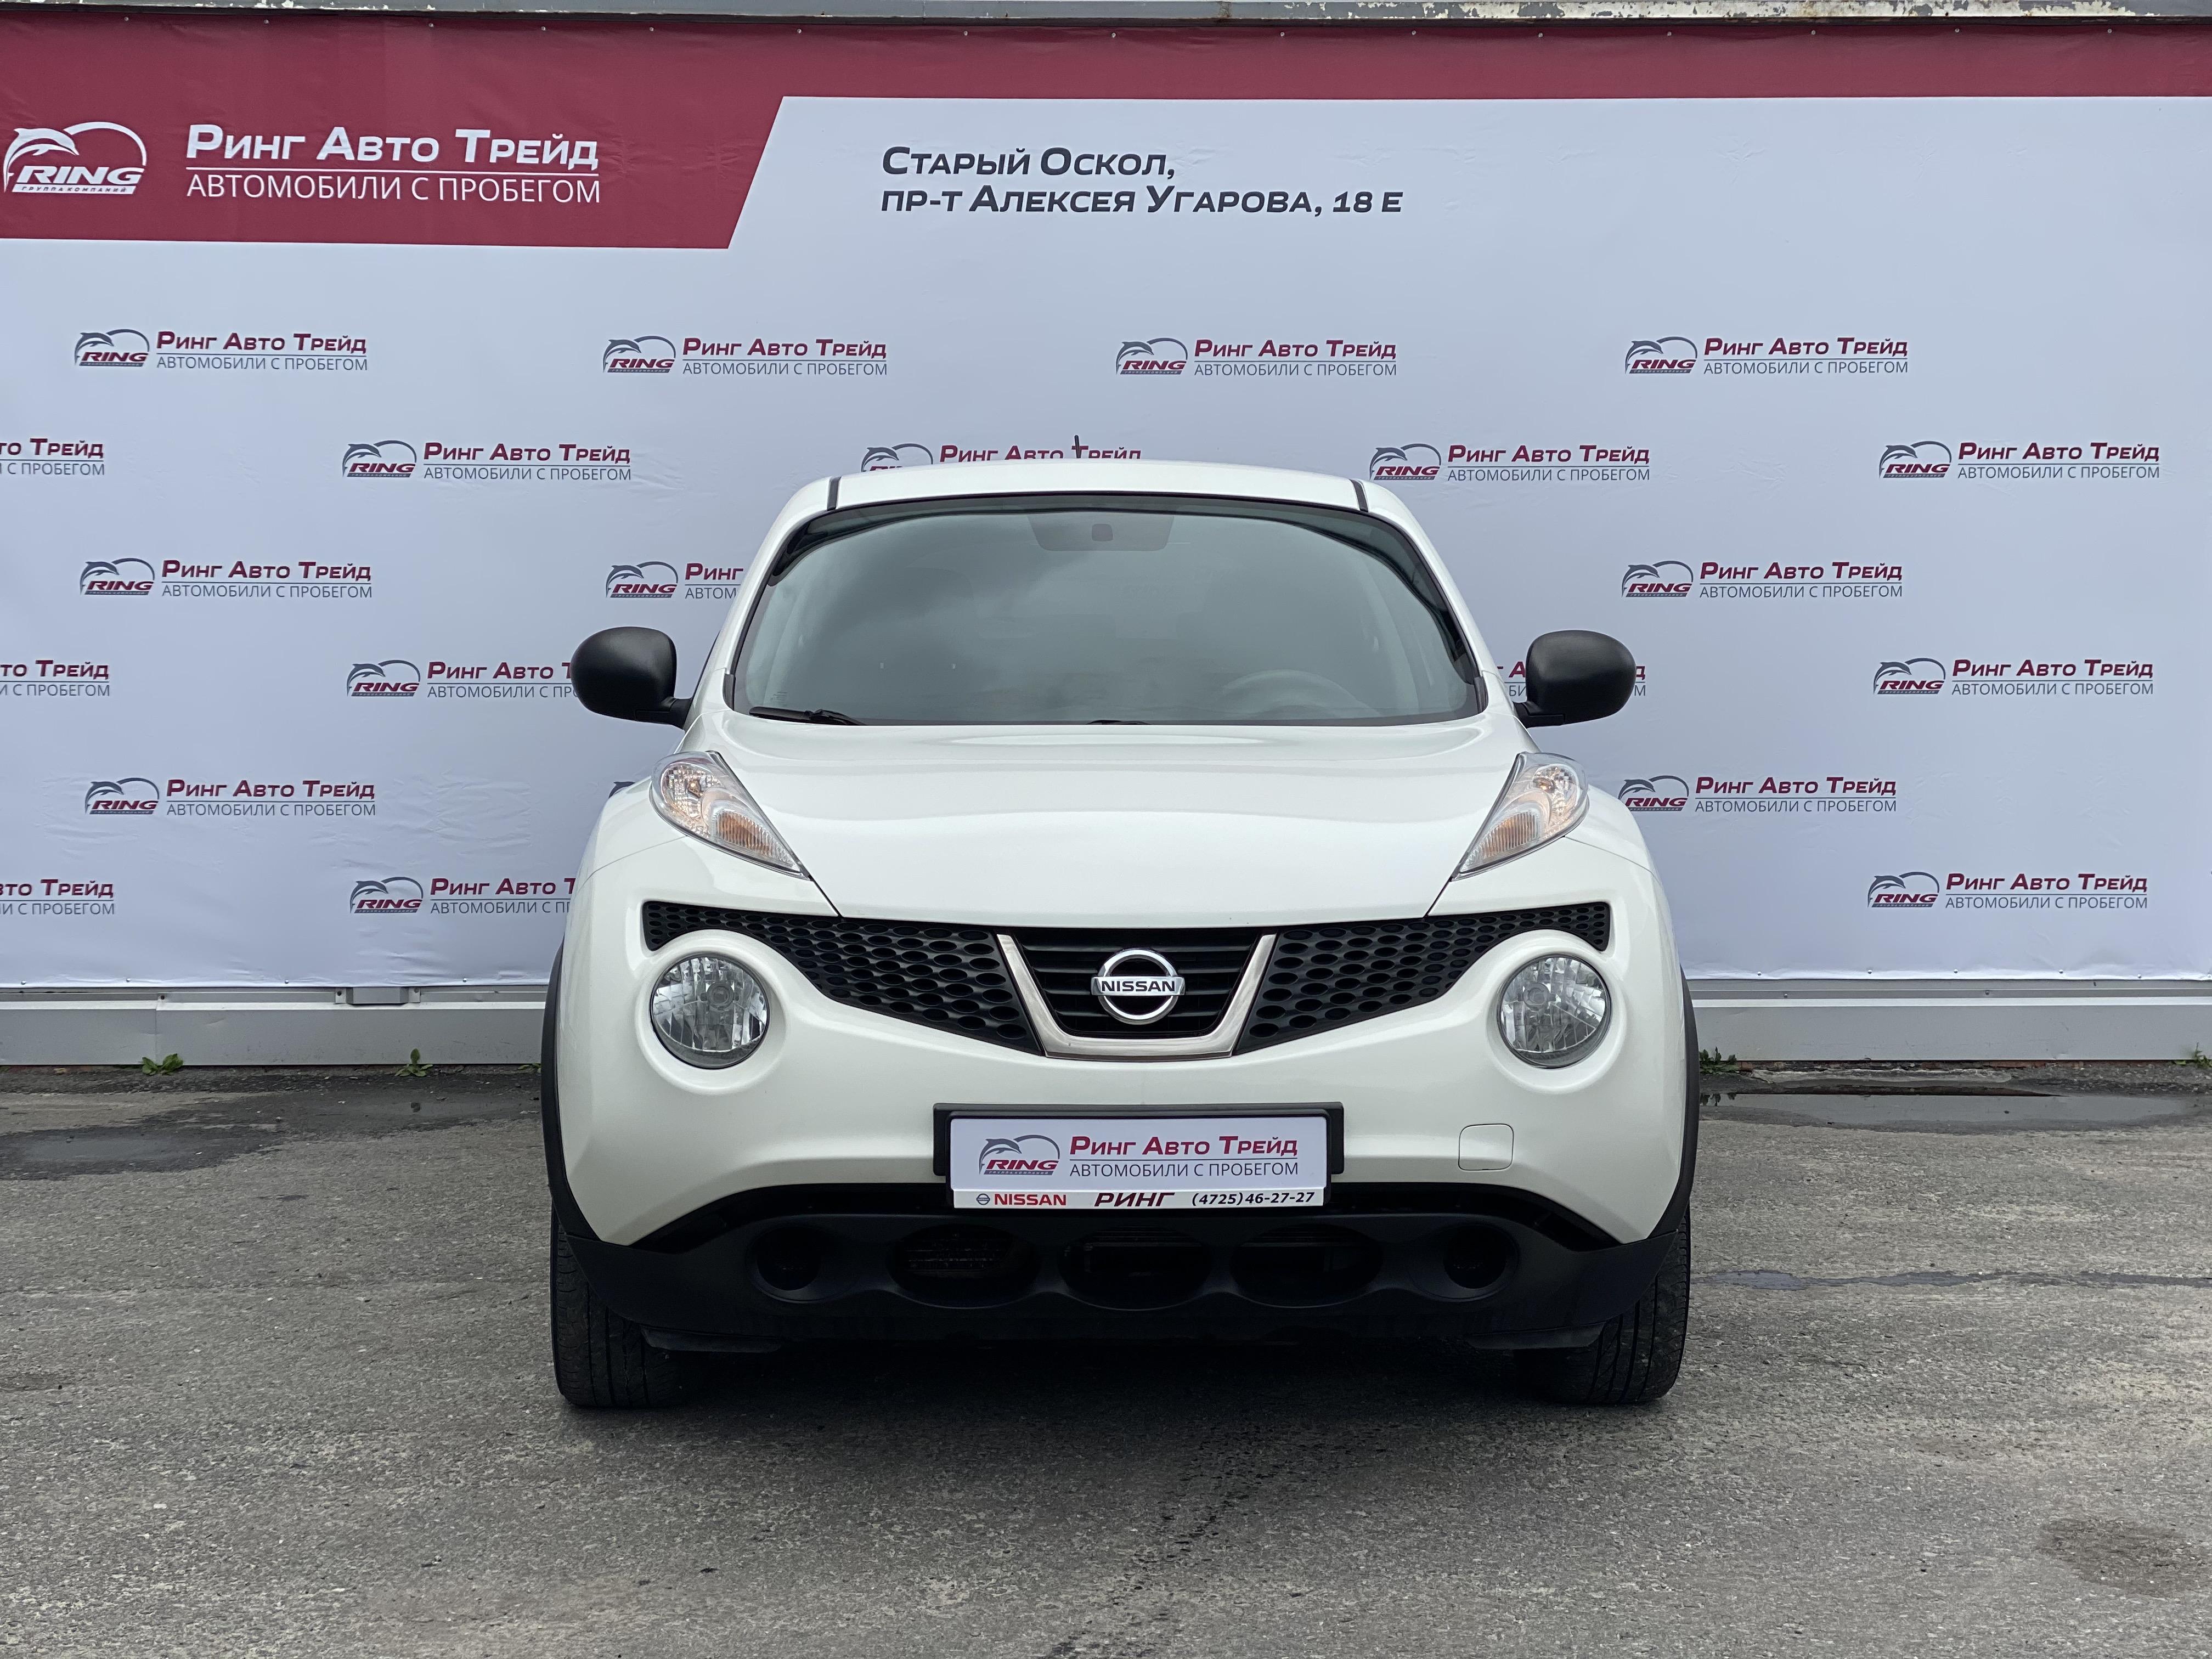 Nissan Juke Внедорожник (2014г.)